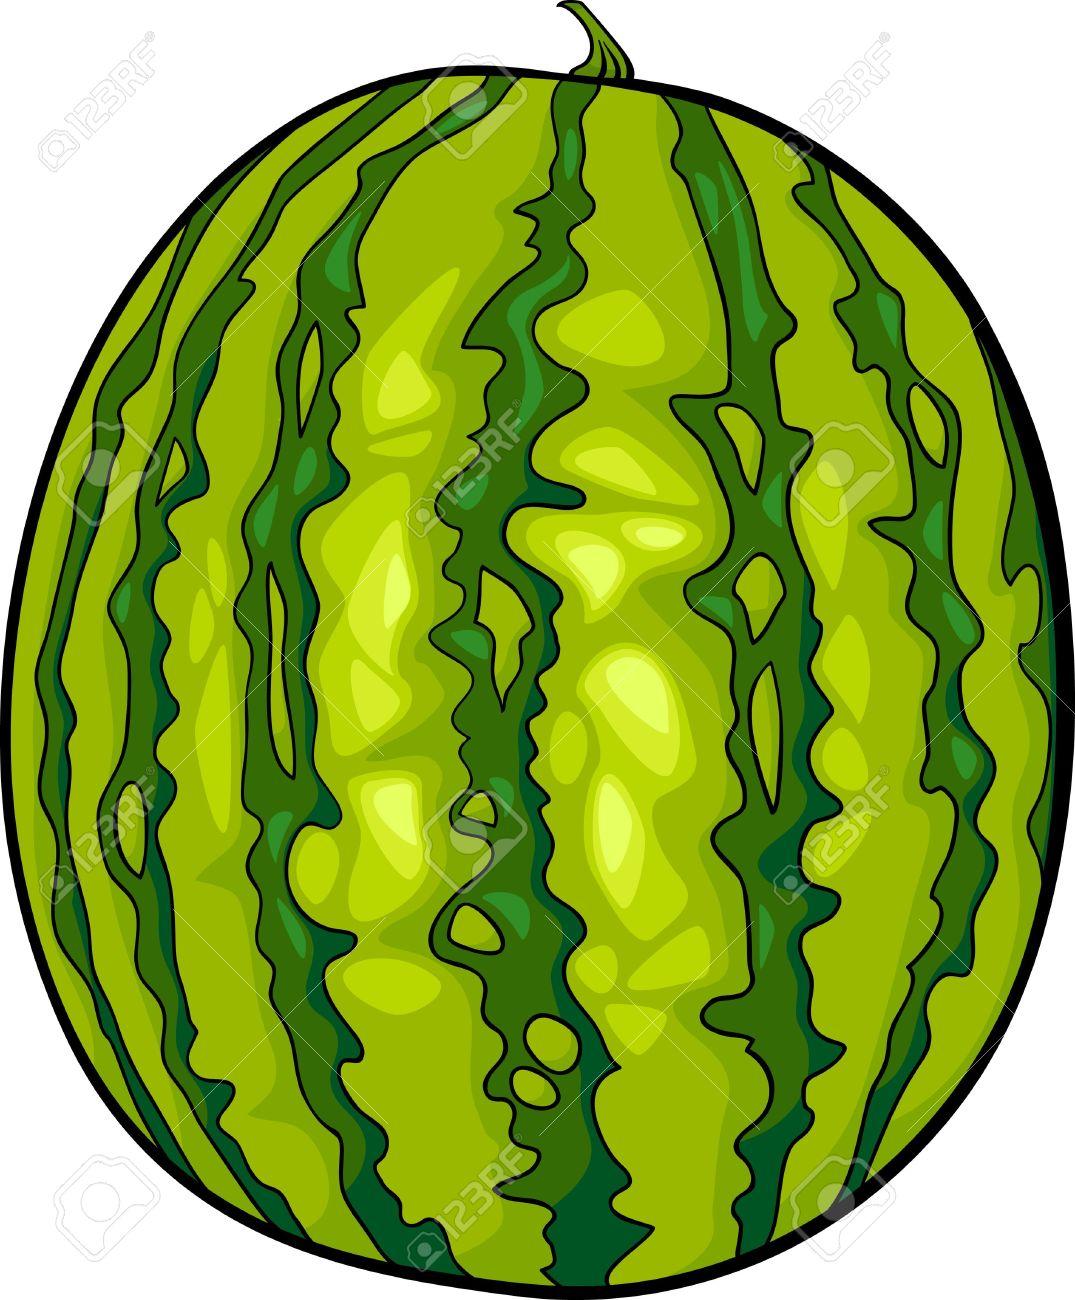 1075x1300 Watermelon Clipart Green Fruit